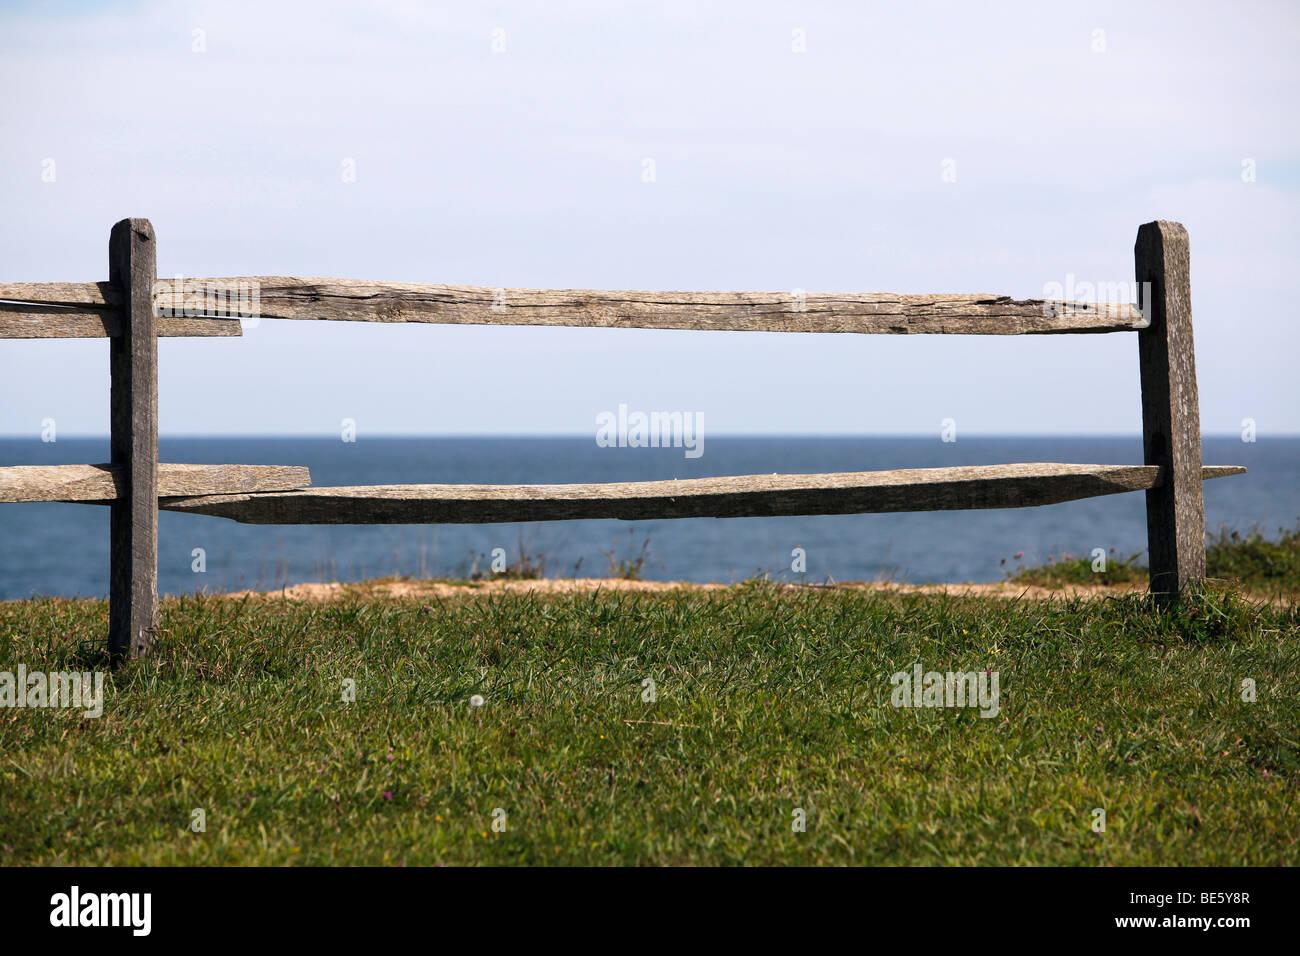 Rail fence, ocean bluff, Montauk, New York - Stock Image